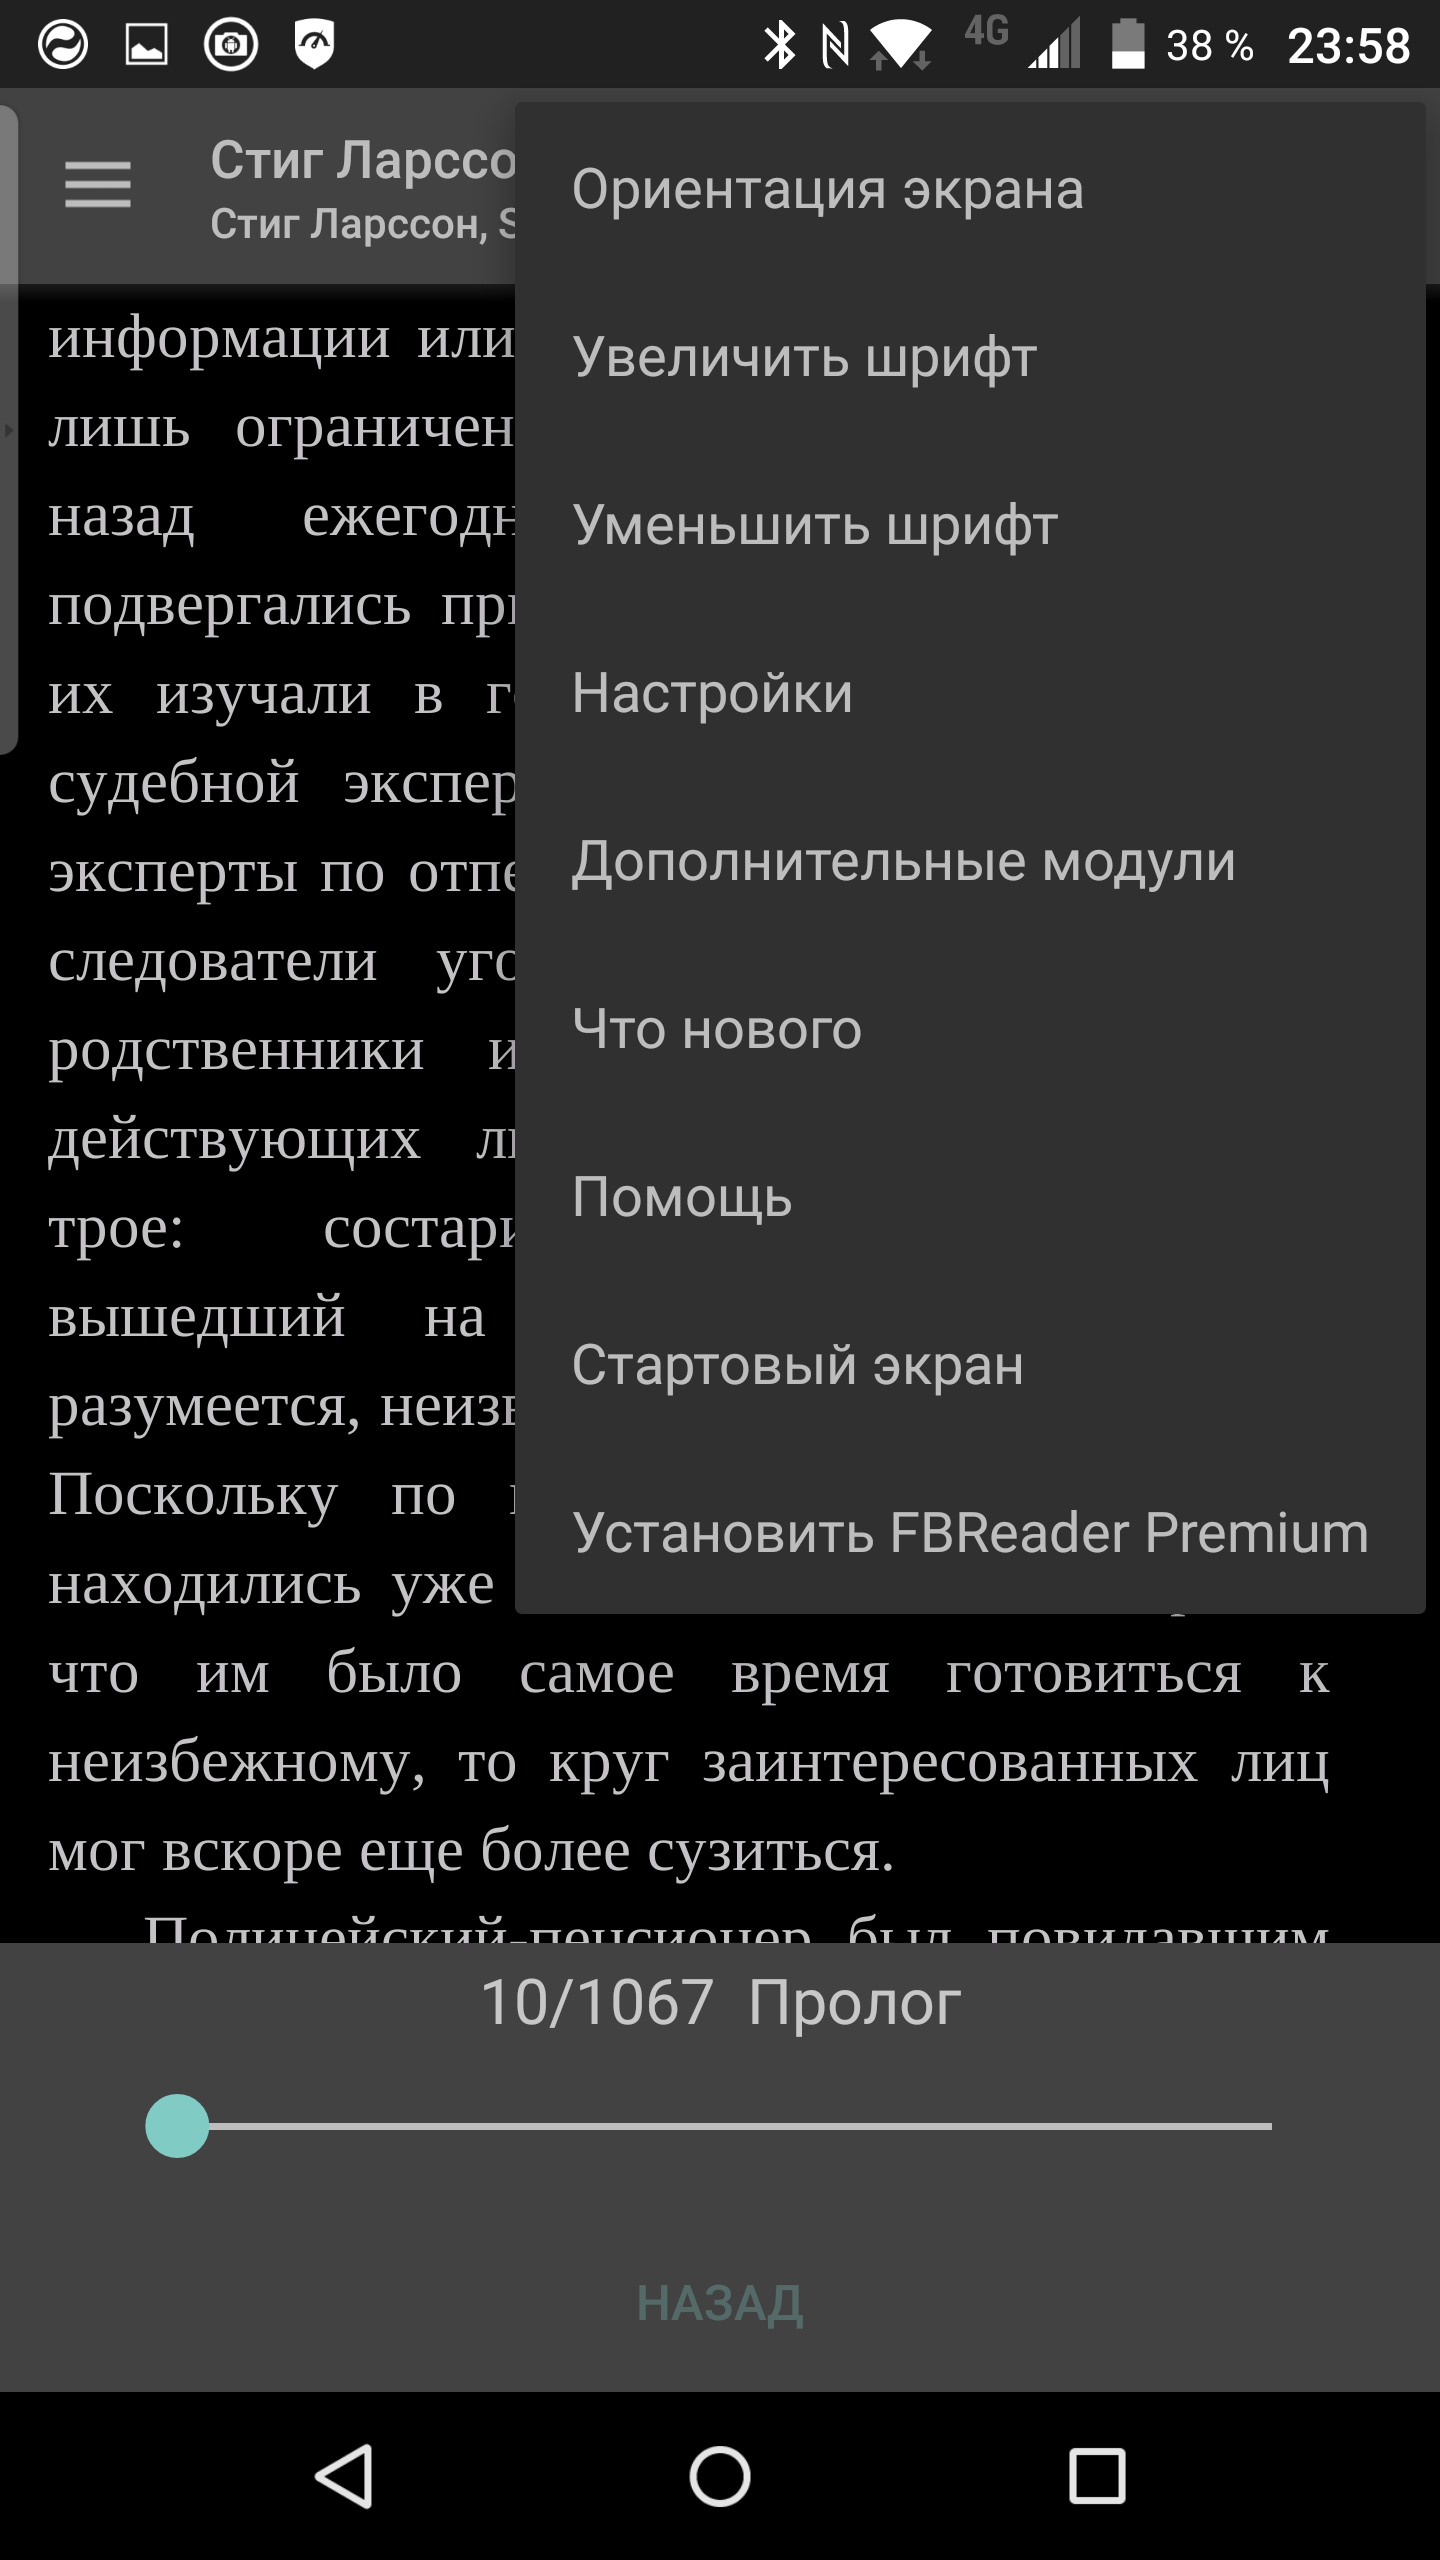 Screenshot_2016-01-23-23-58-49